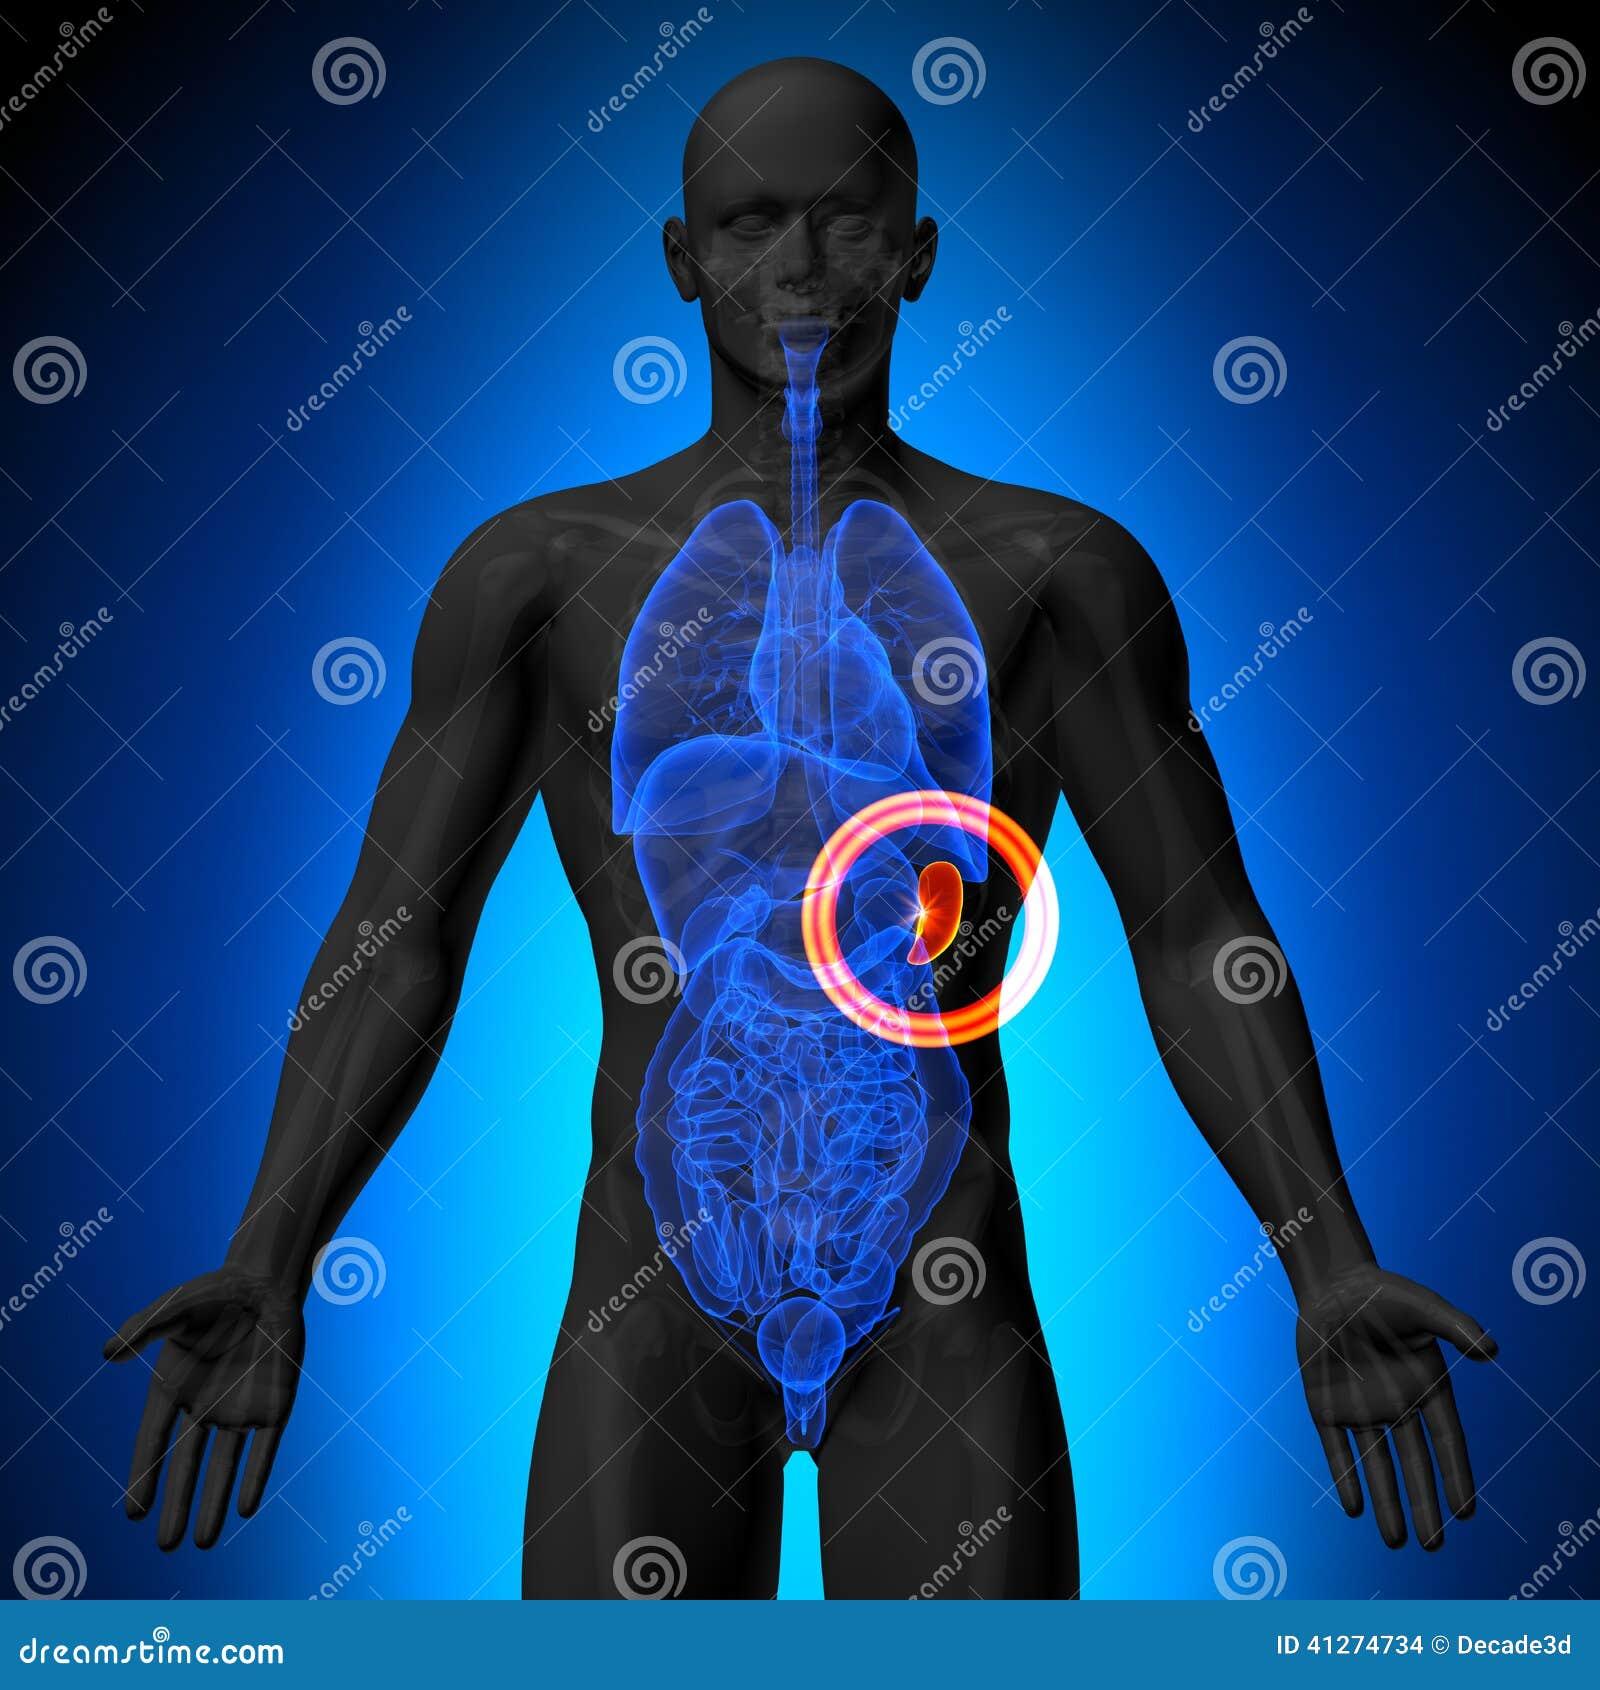 Spleen - Male anatomy of human organs - x-ray view